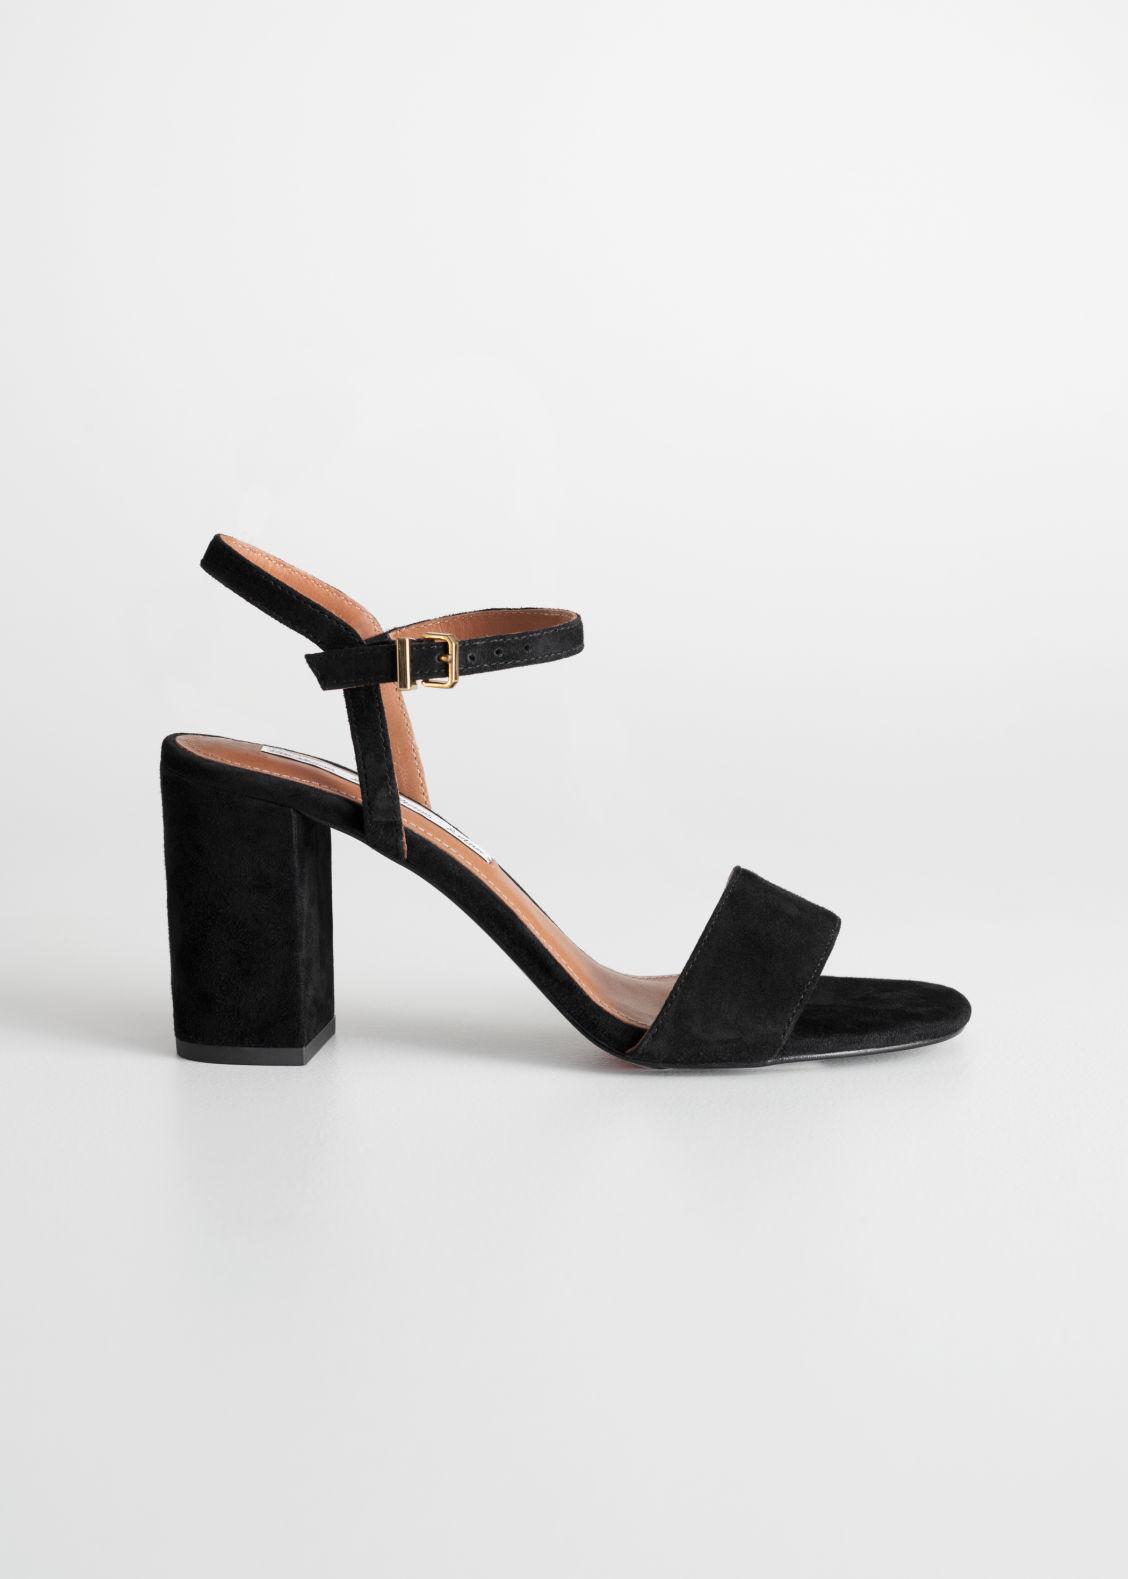 & OTHER STORIES Strappy Block Heel Sandals - Black Explorar K8PNW